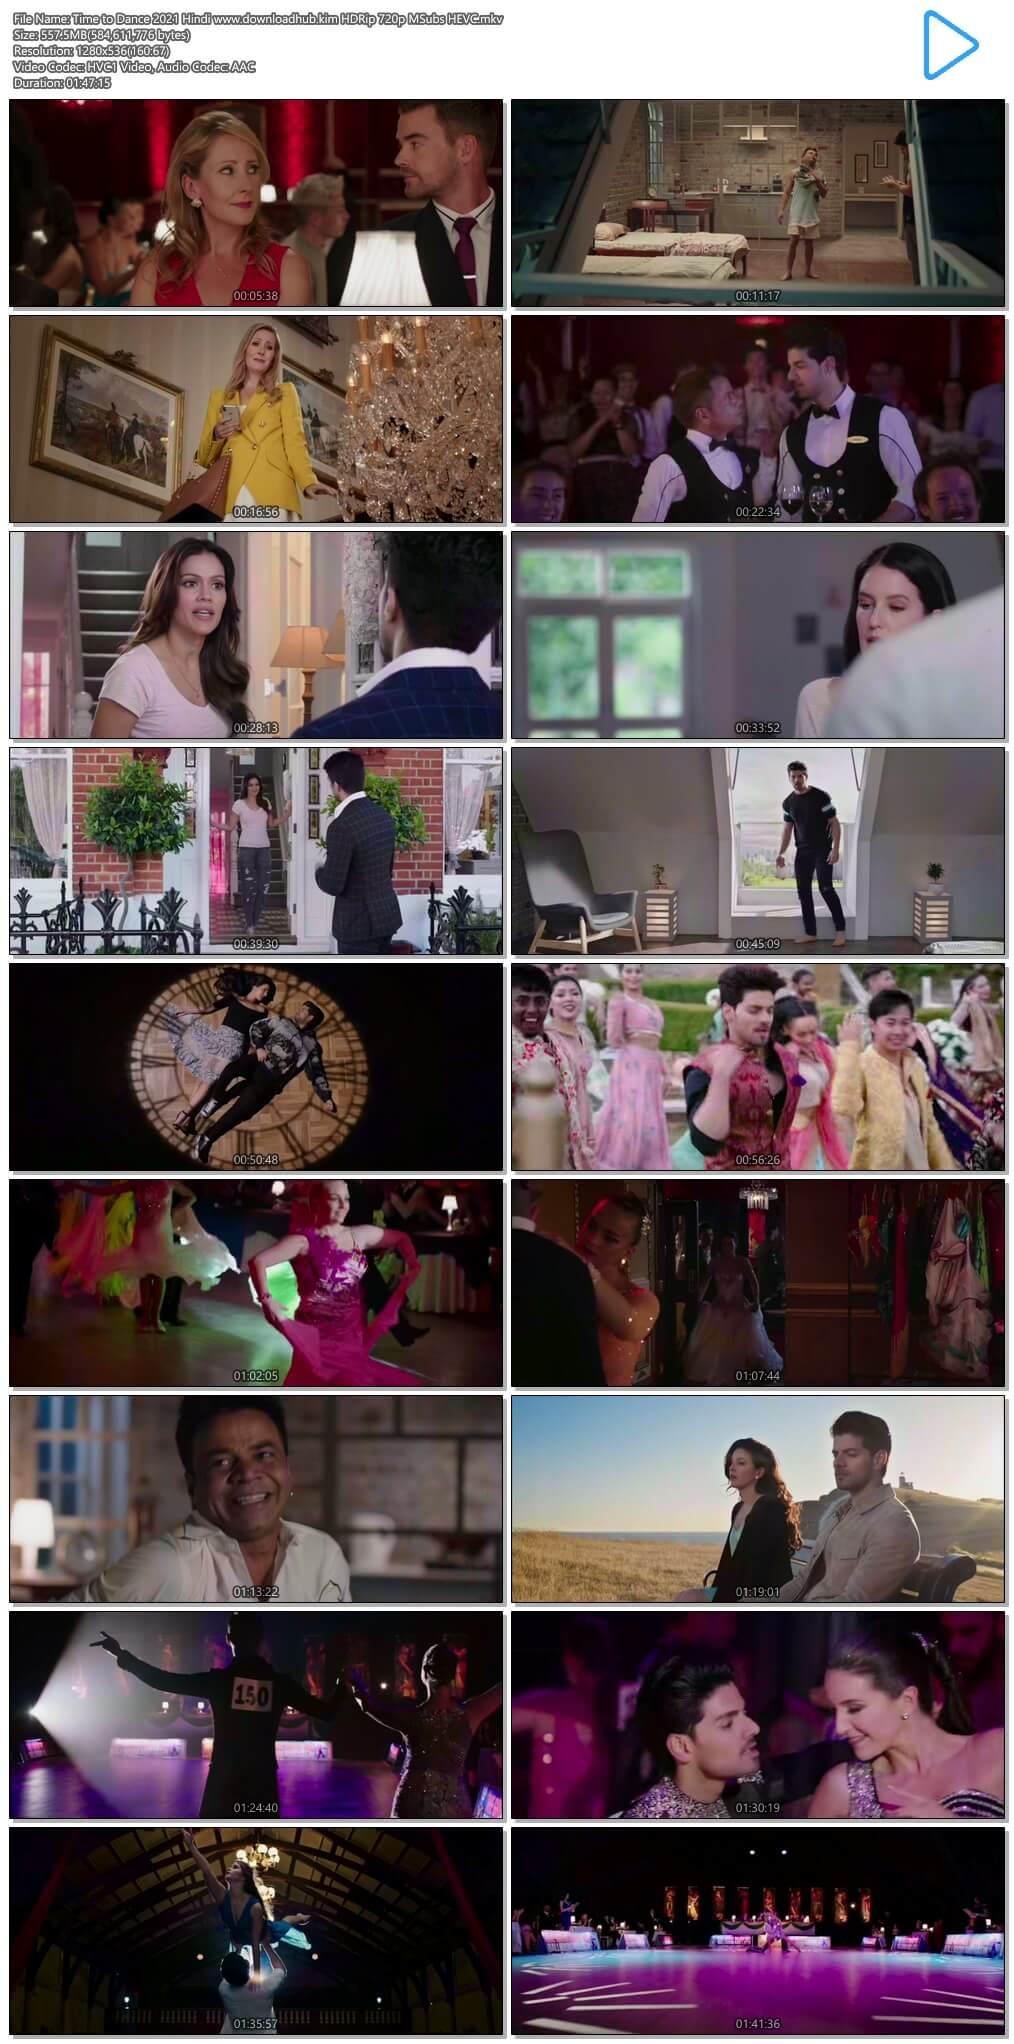 Time to Dance 2021 Hindi 550MB HDRip 720p MSubs HEVC